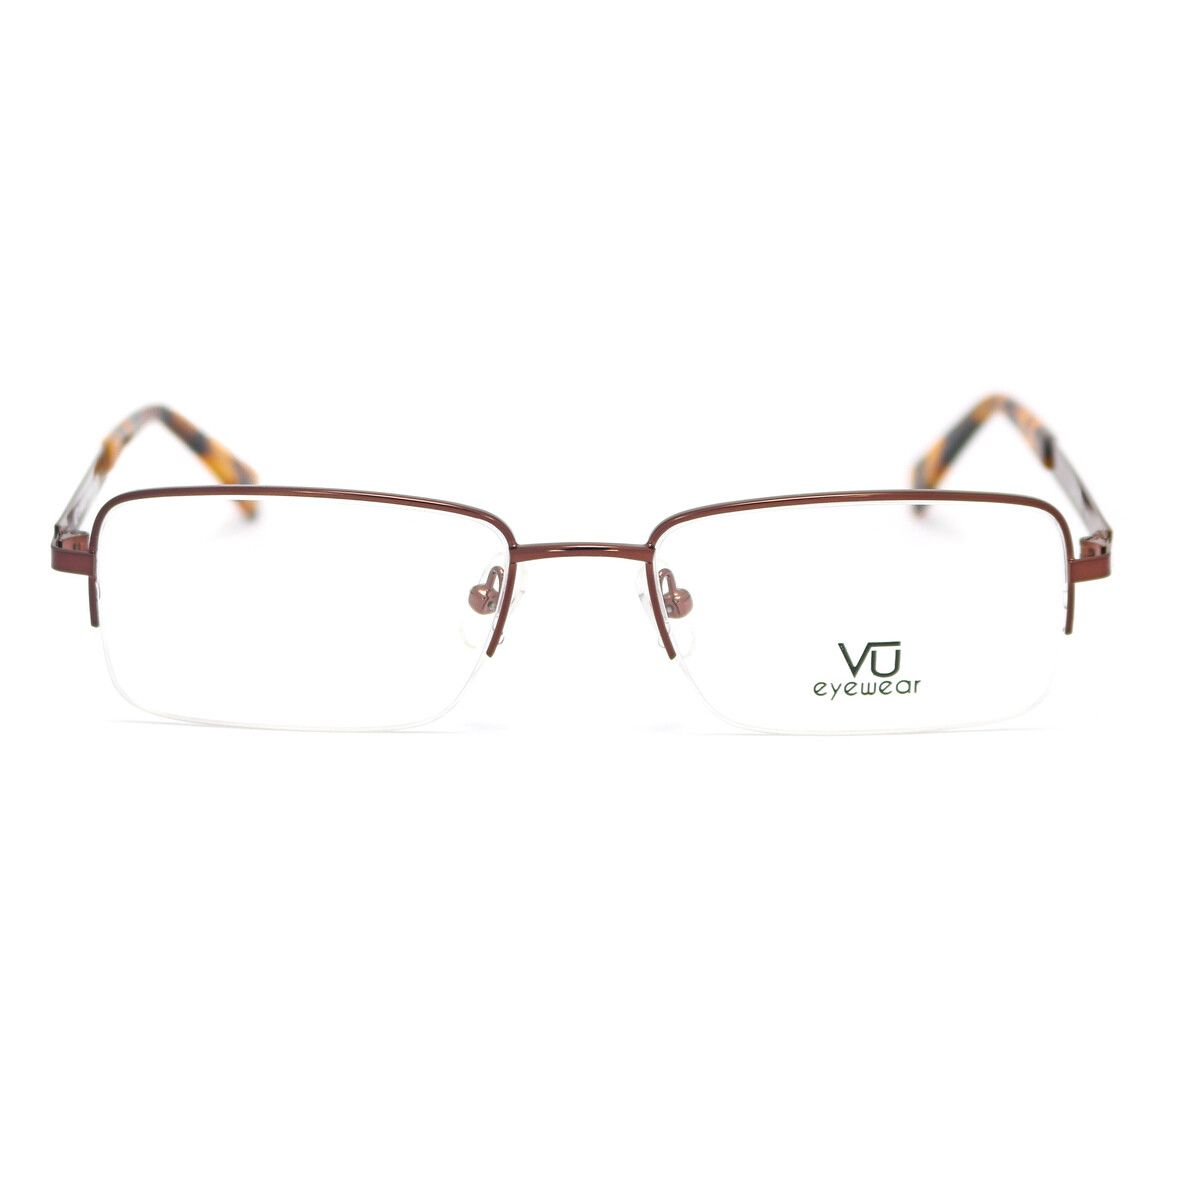 Vue - 6677 30 size - 53